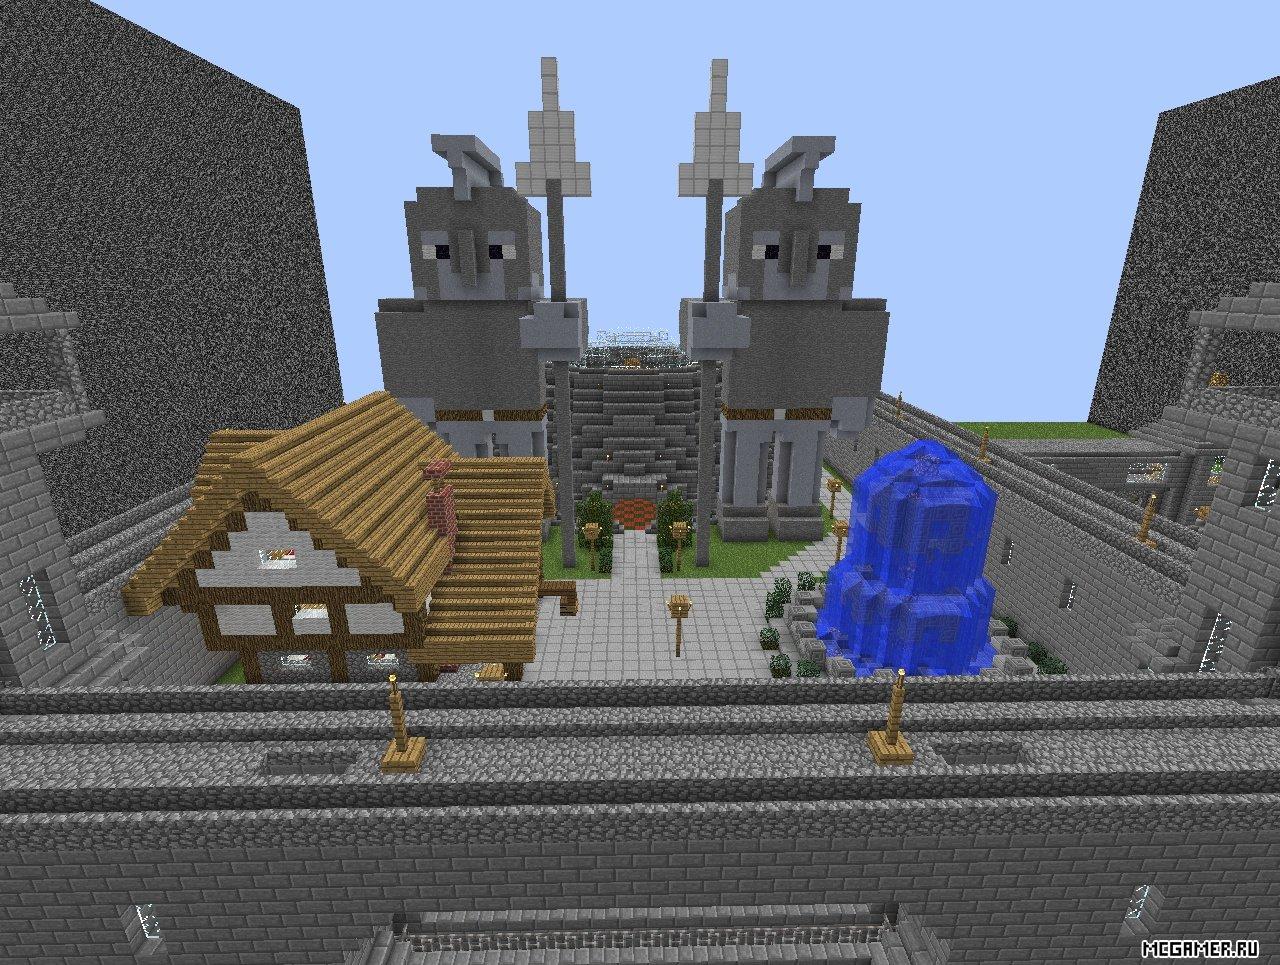 Постройка Замка в Minecraft